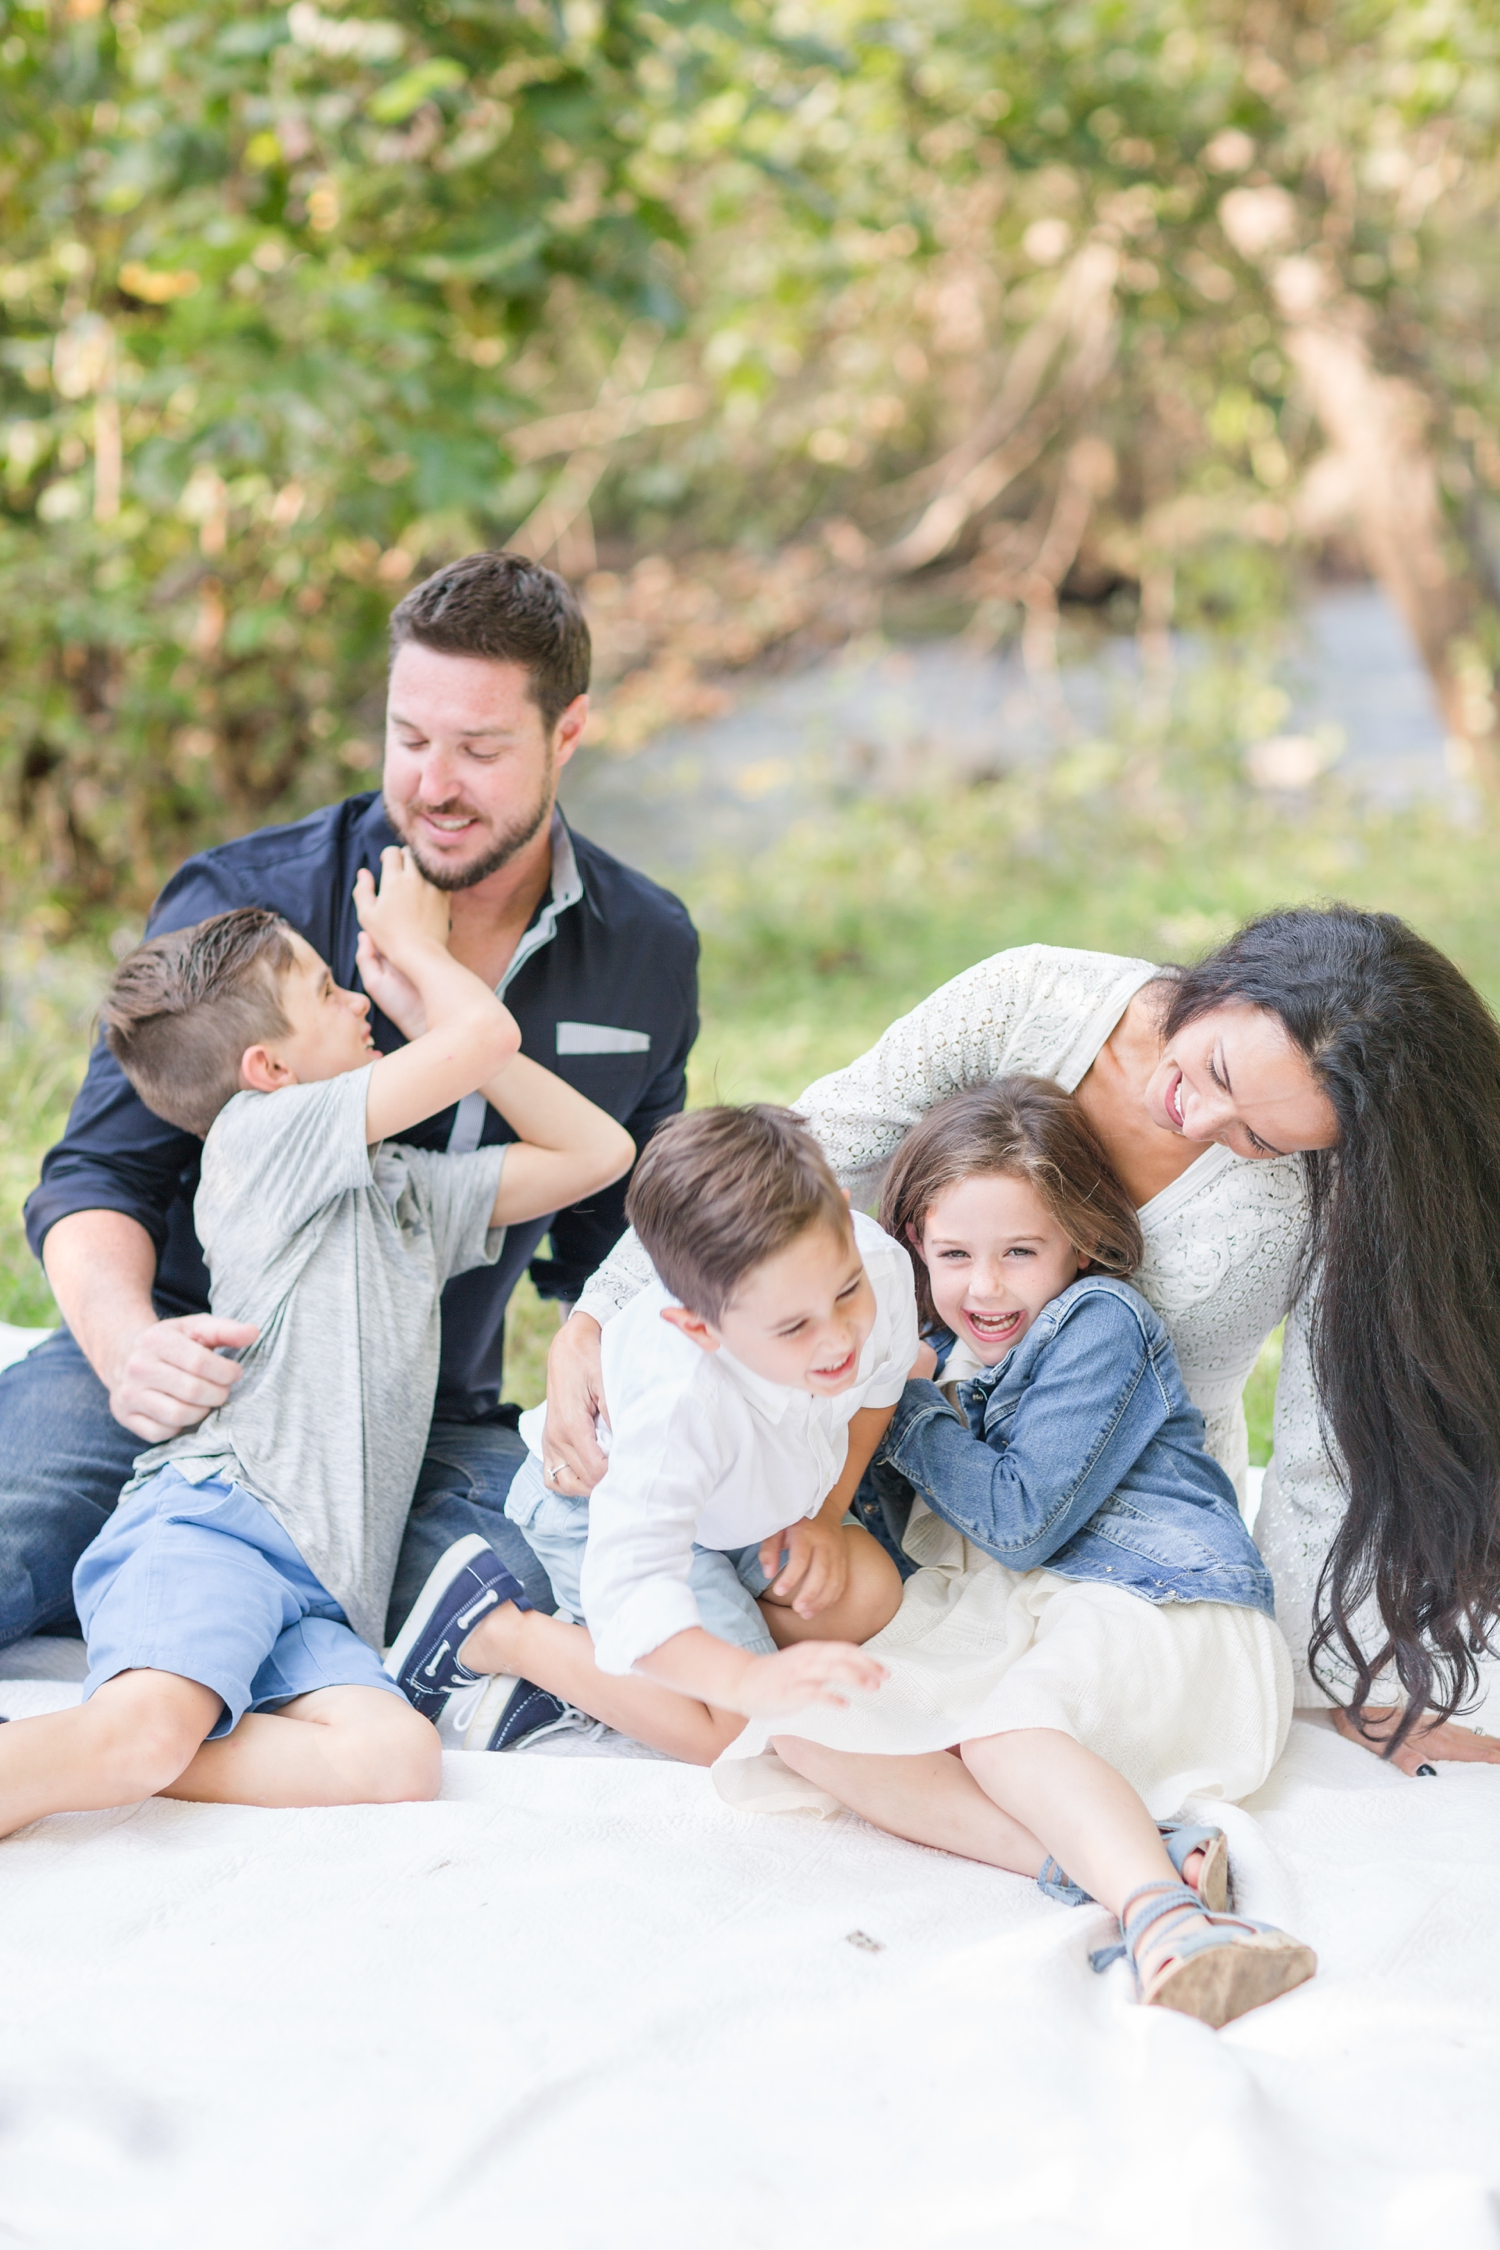 Smith-Padgett Family 2018-43_Jerusalem-Mill-Maryland-Family-Photographer-anna-grace-photography-photo.jpg